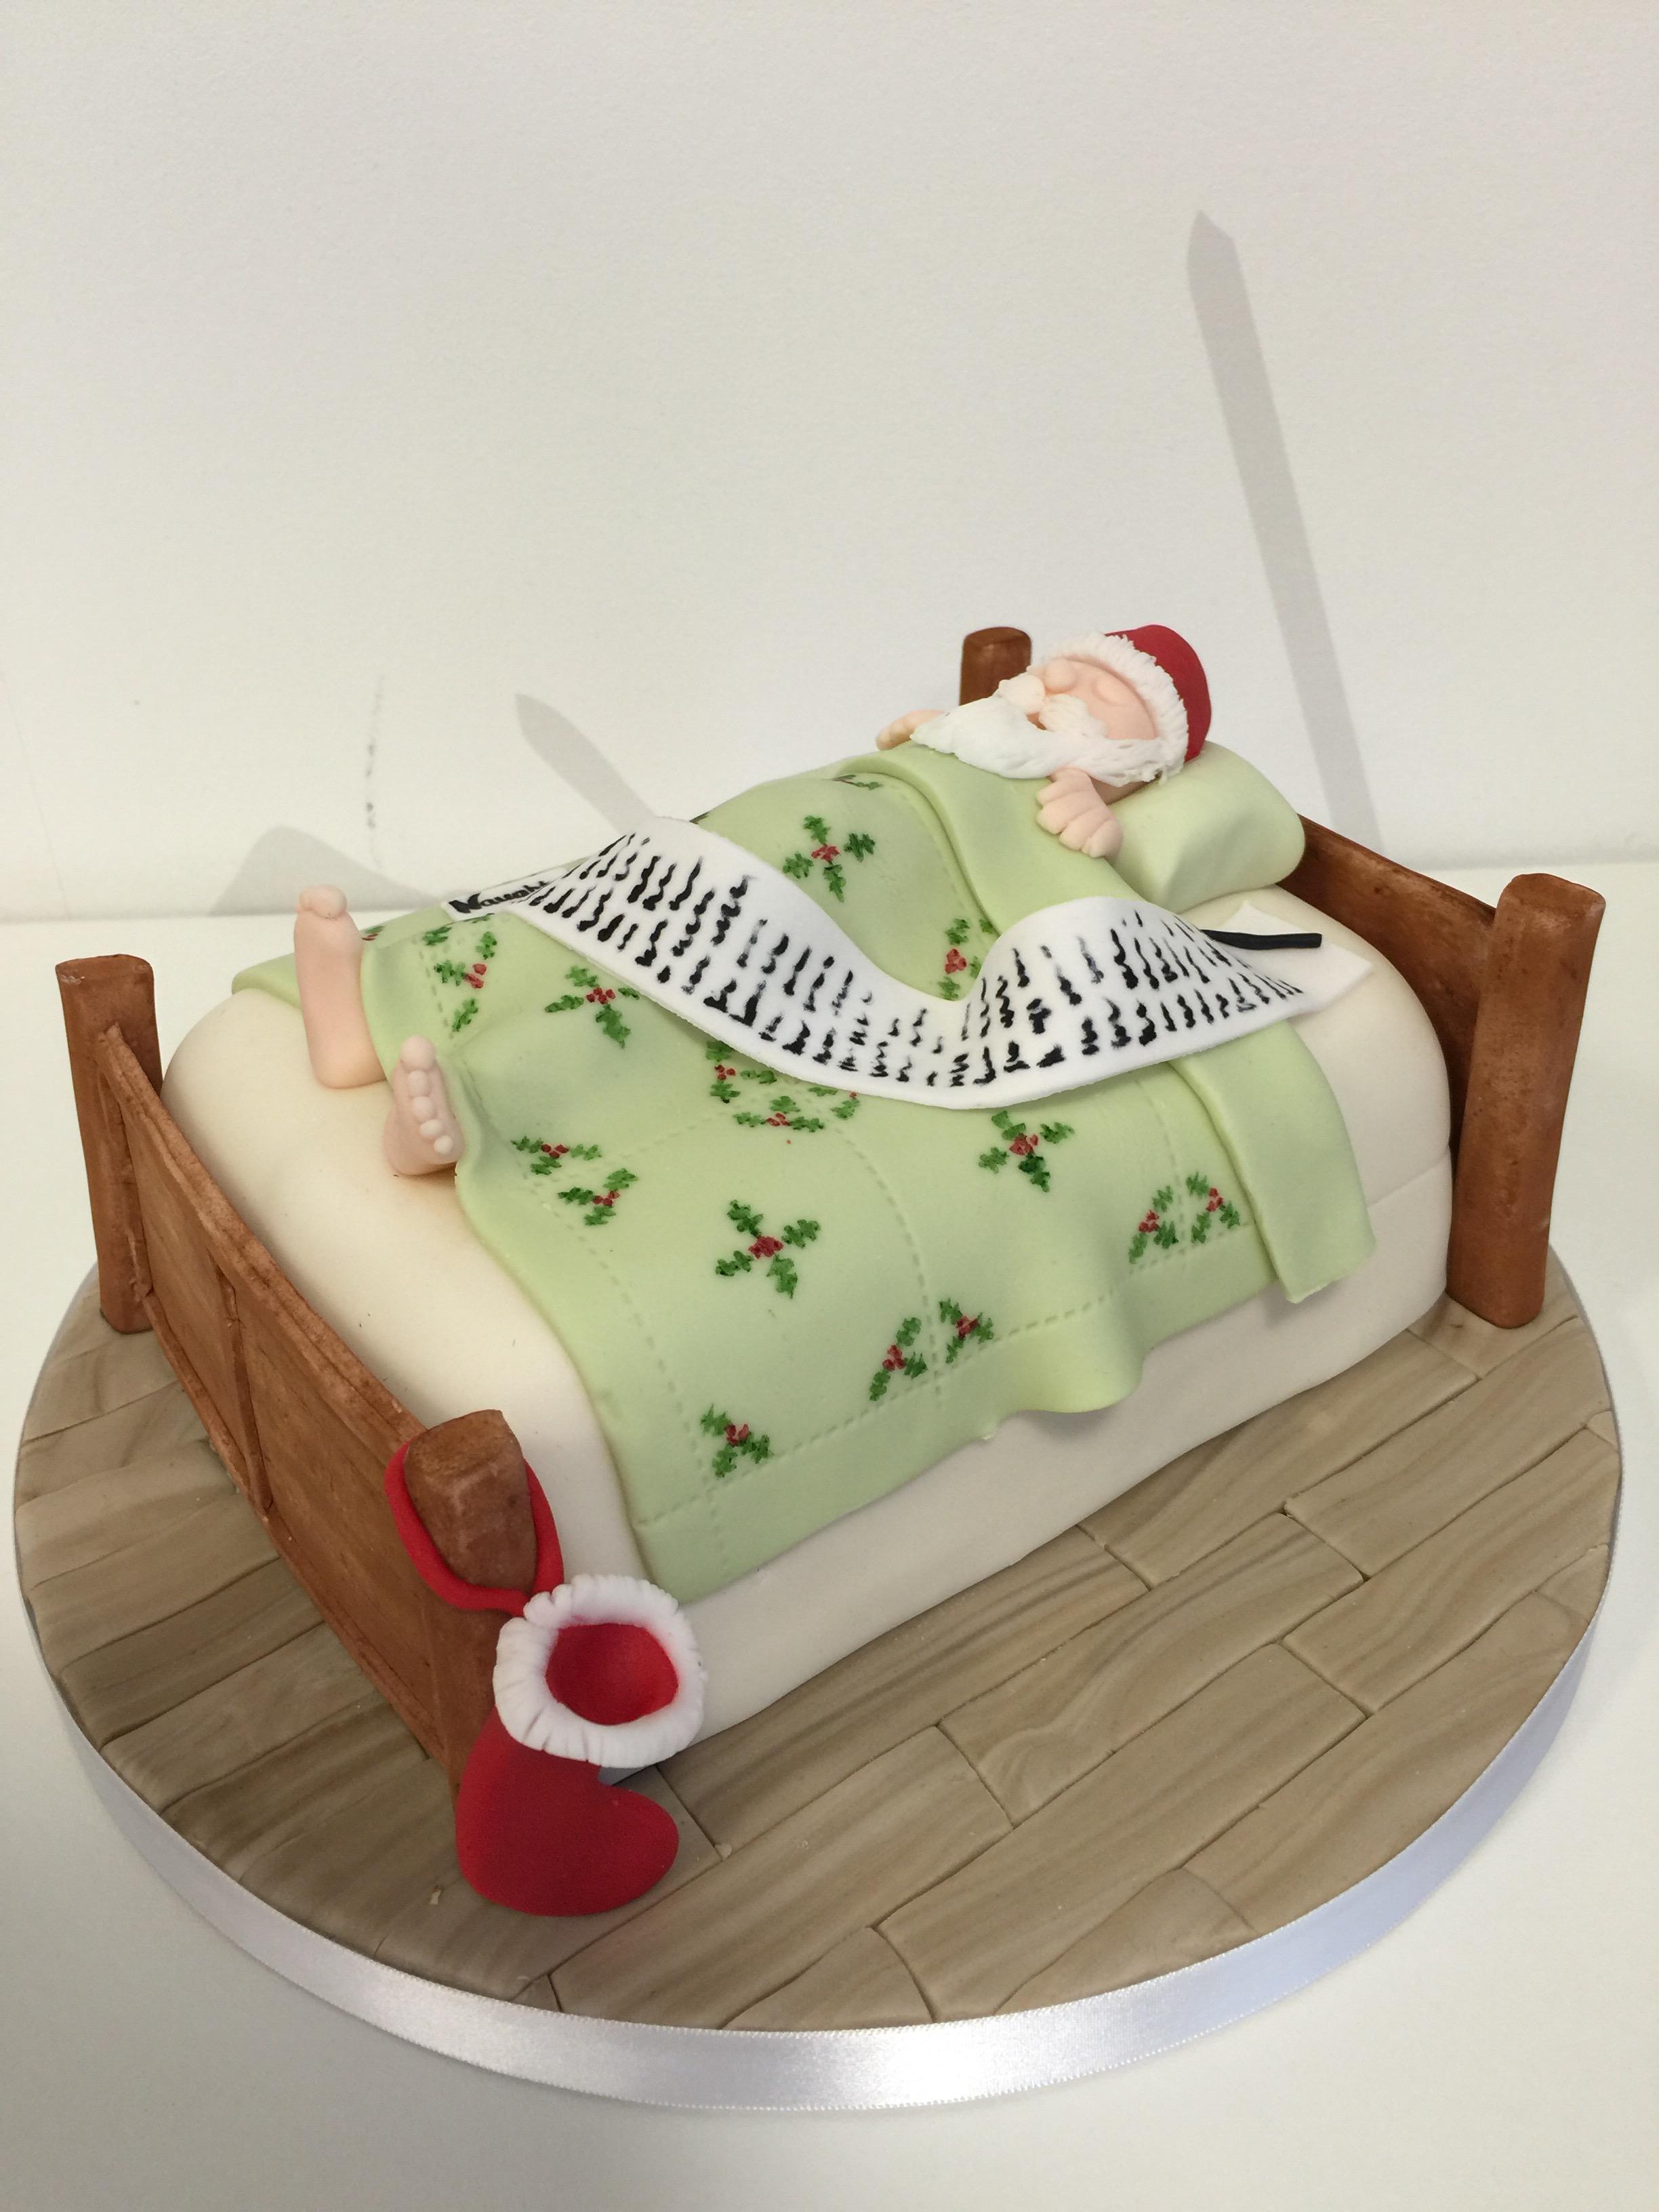 How to make a father christmas cake decoration - I Decided That I Would Offer To Make A Christmas Cake I Had No Idea How